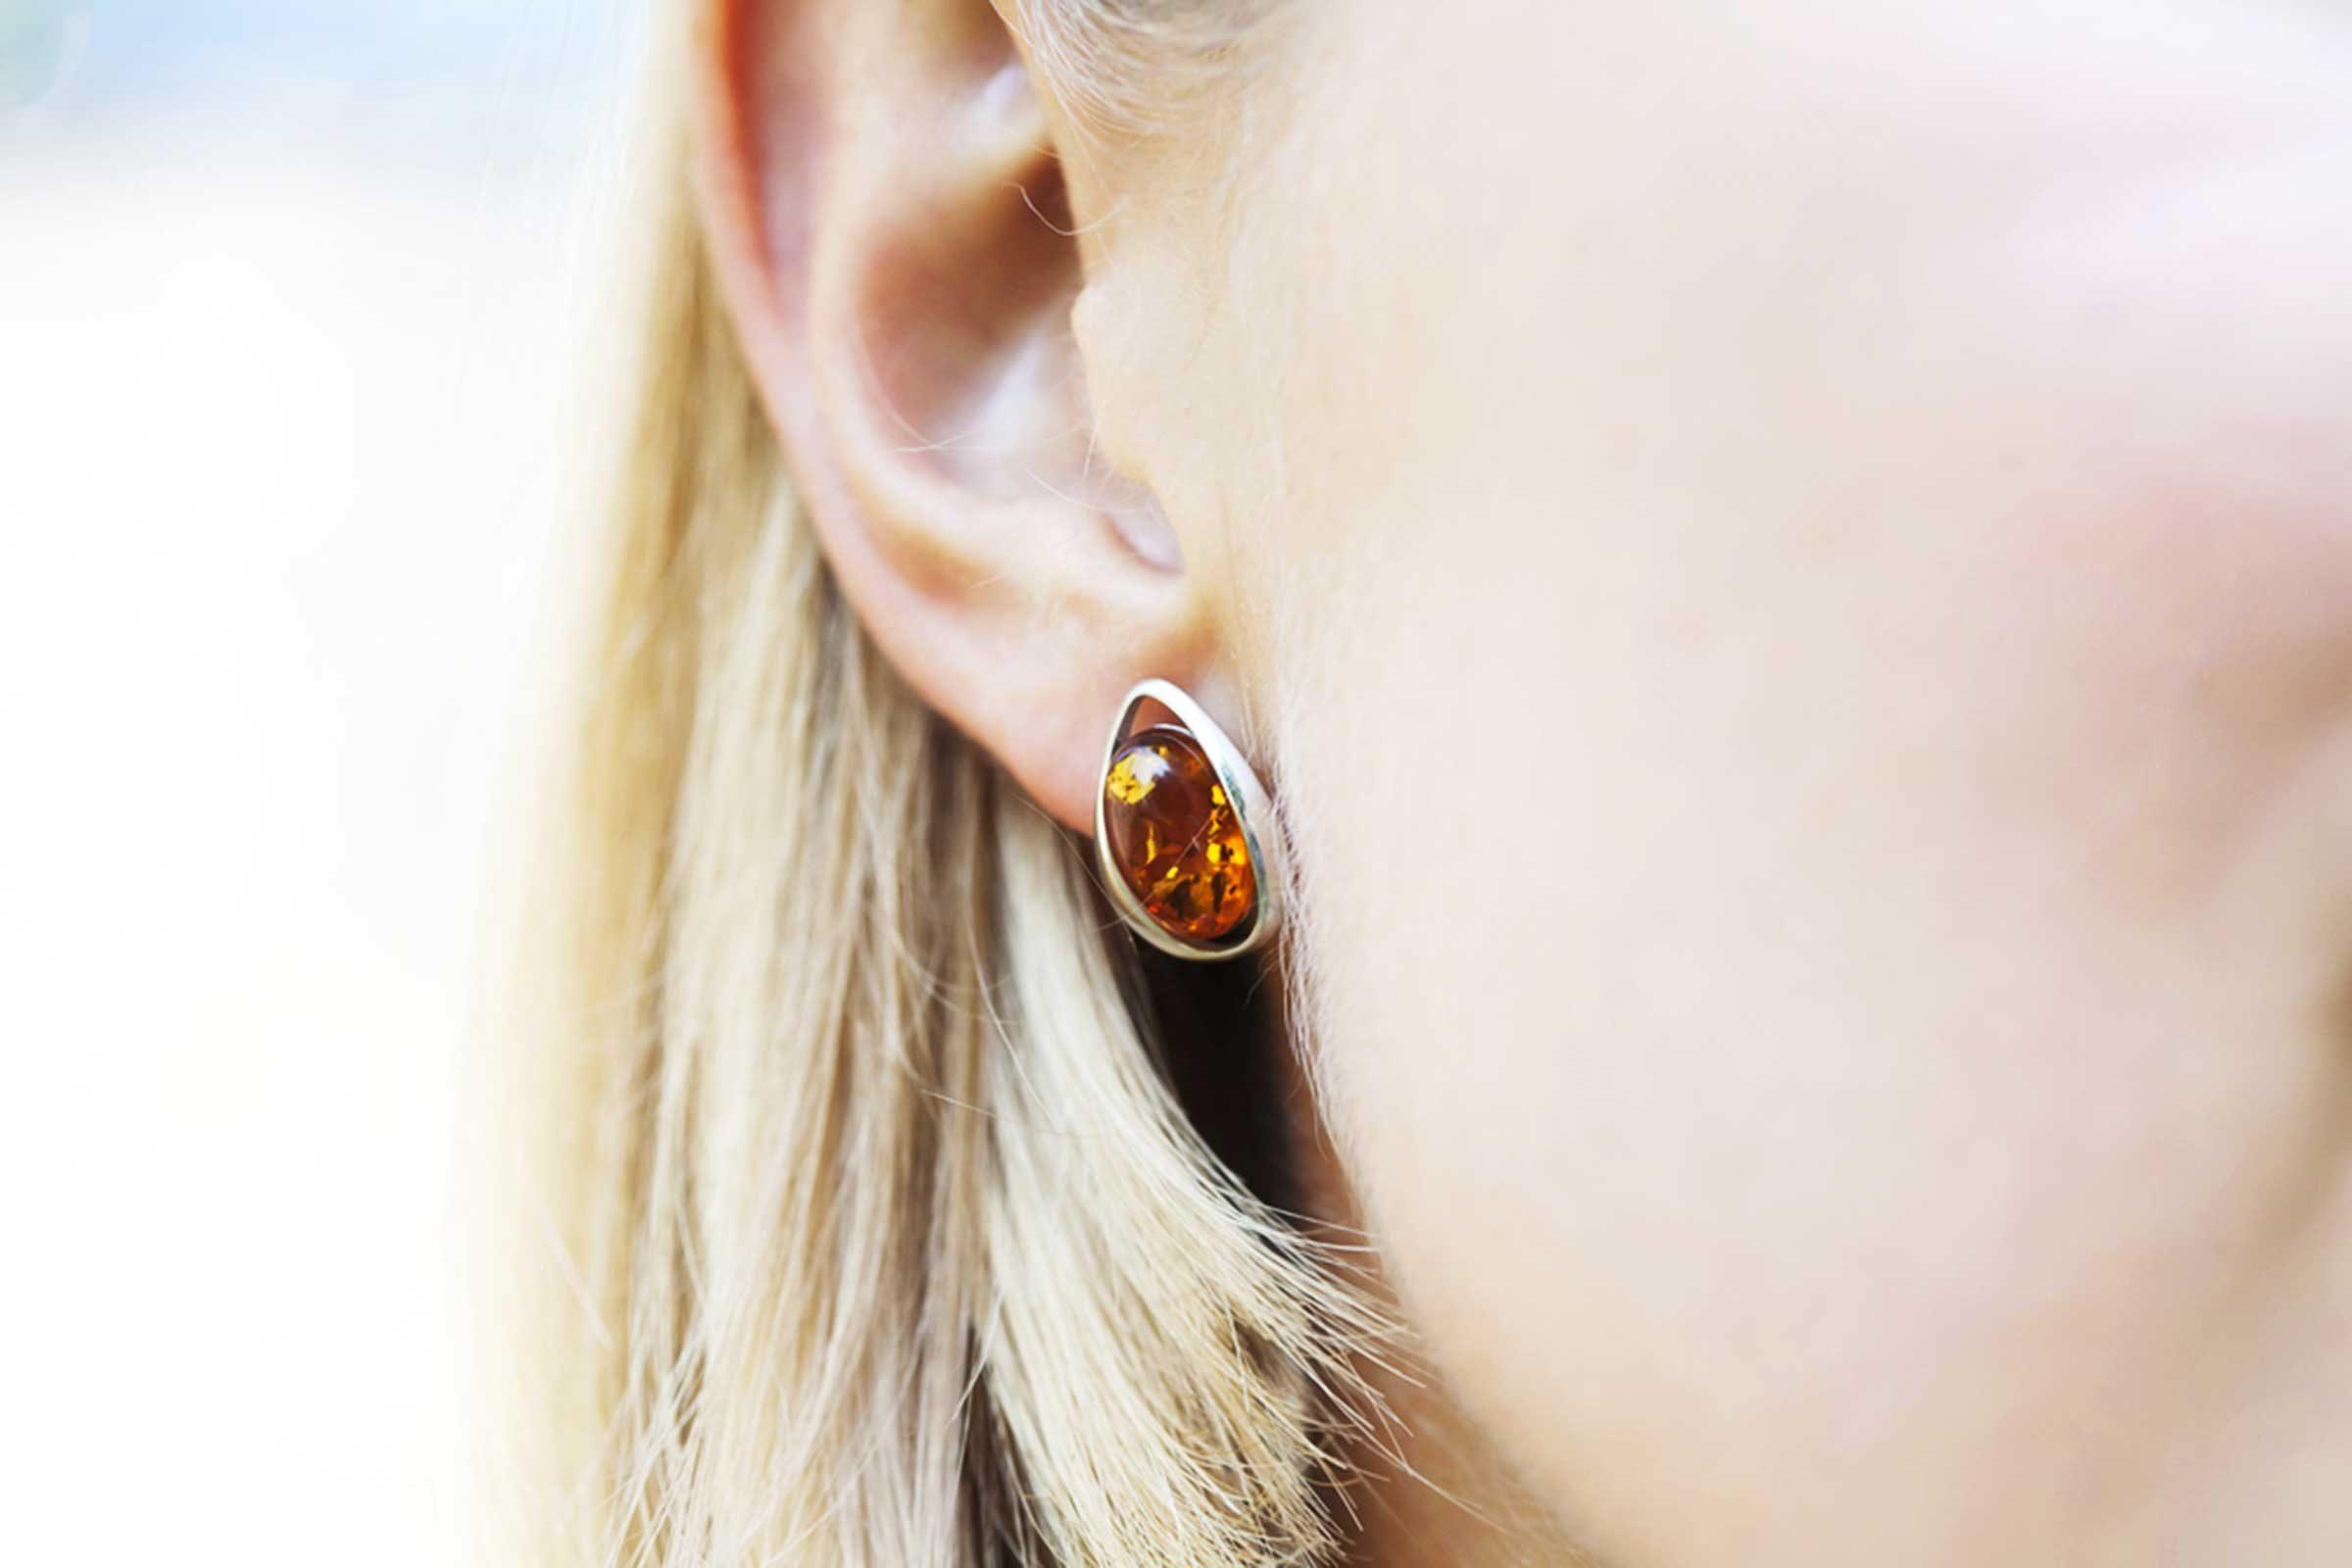 closeup of woman's ears